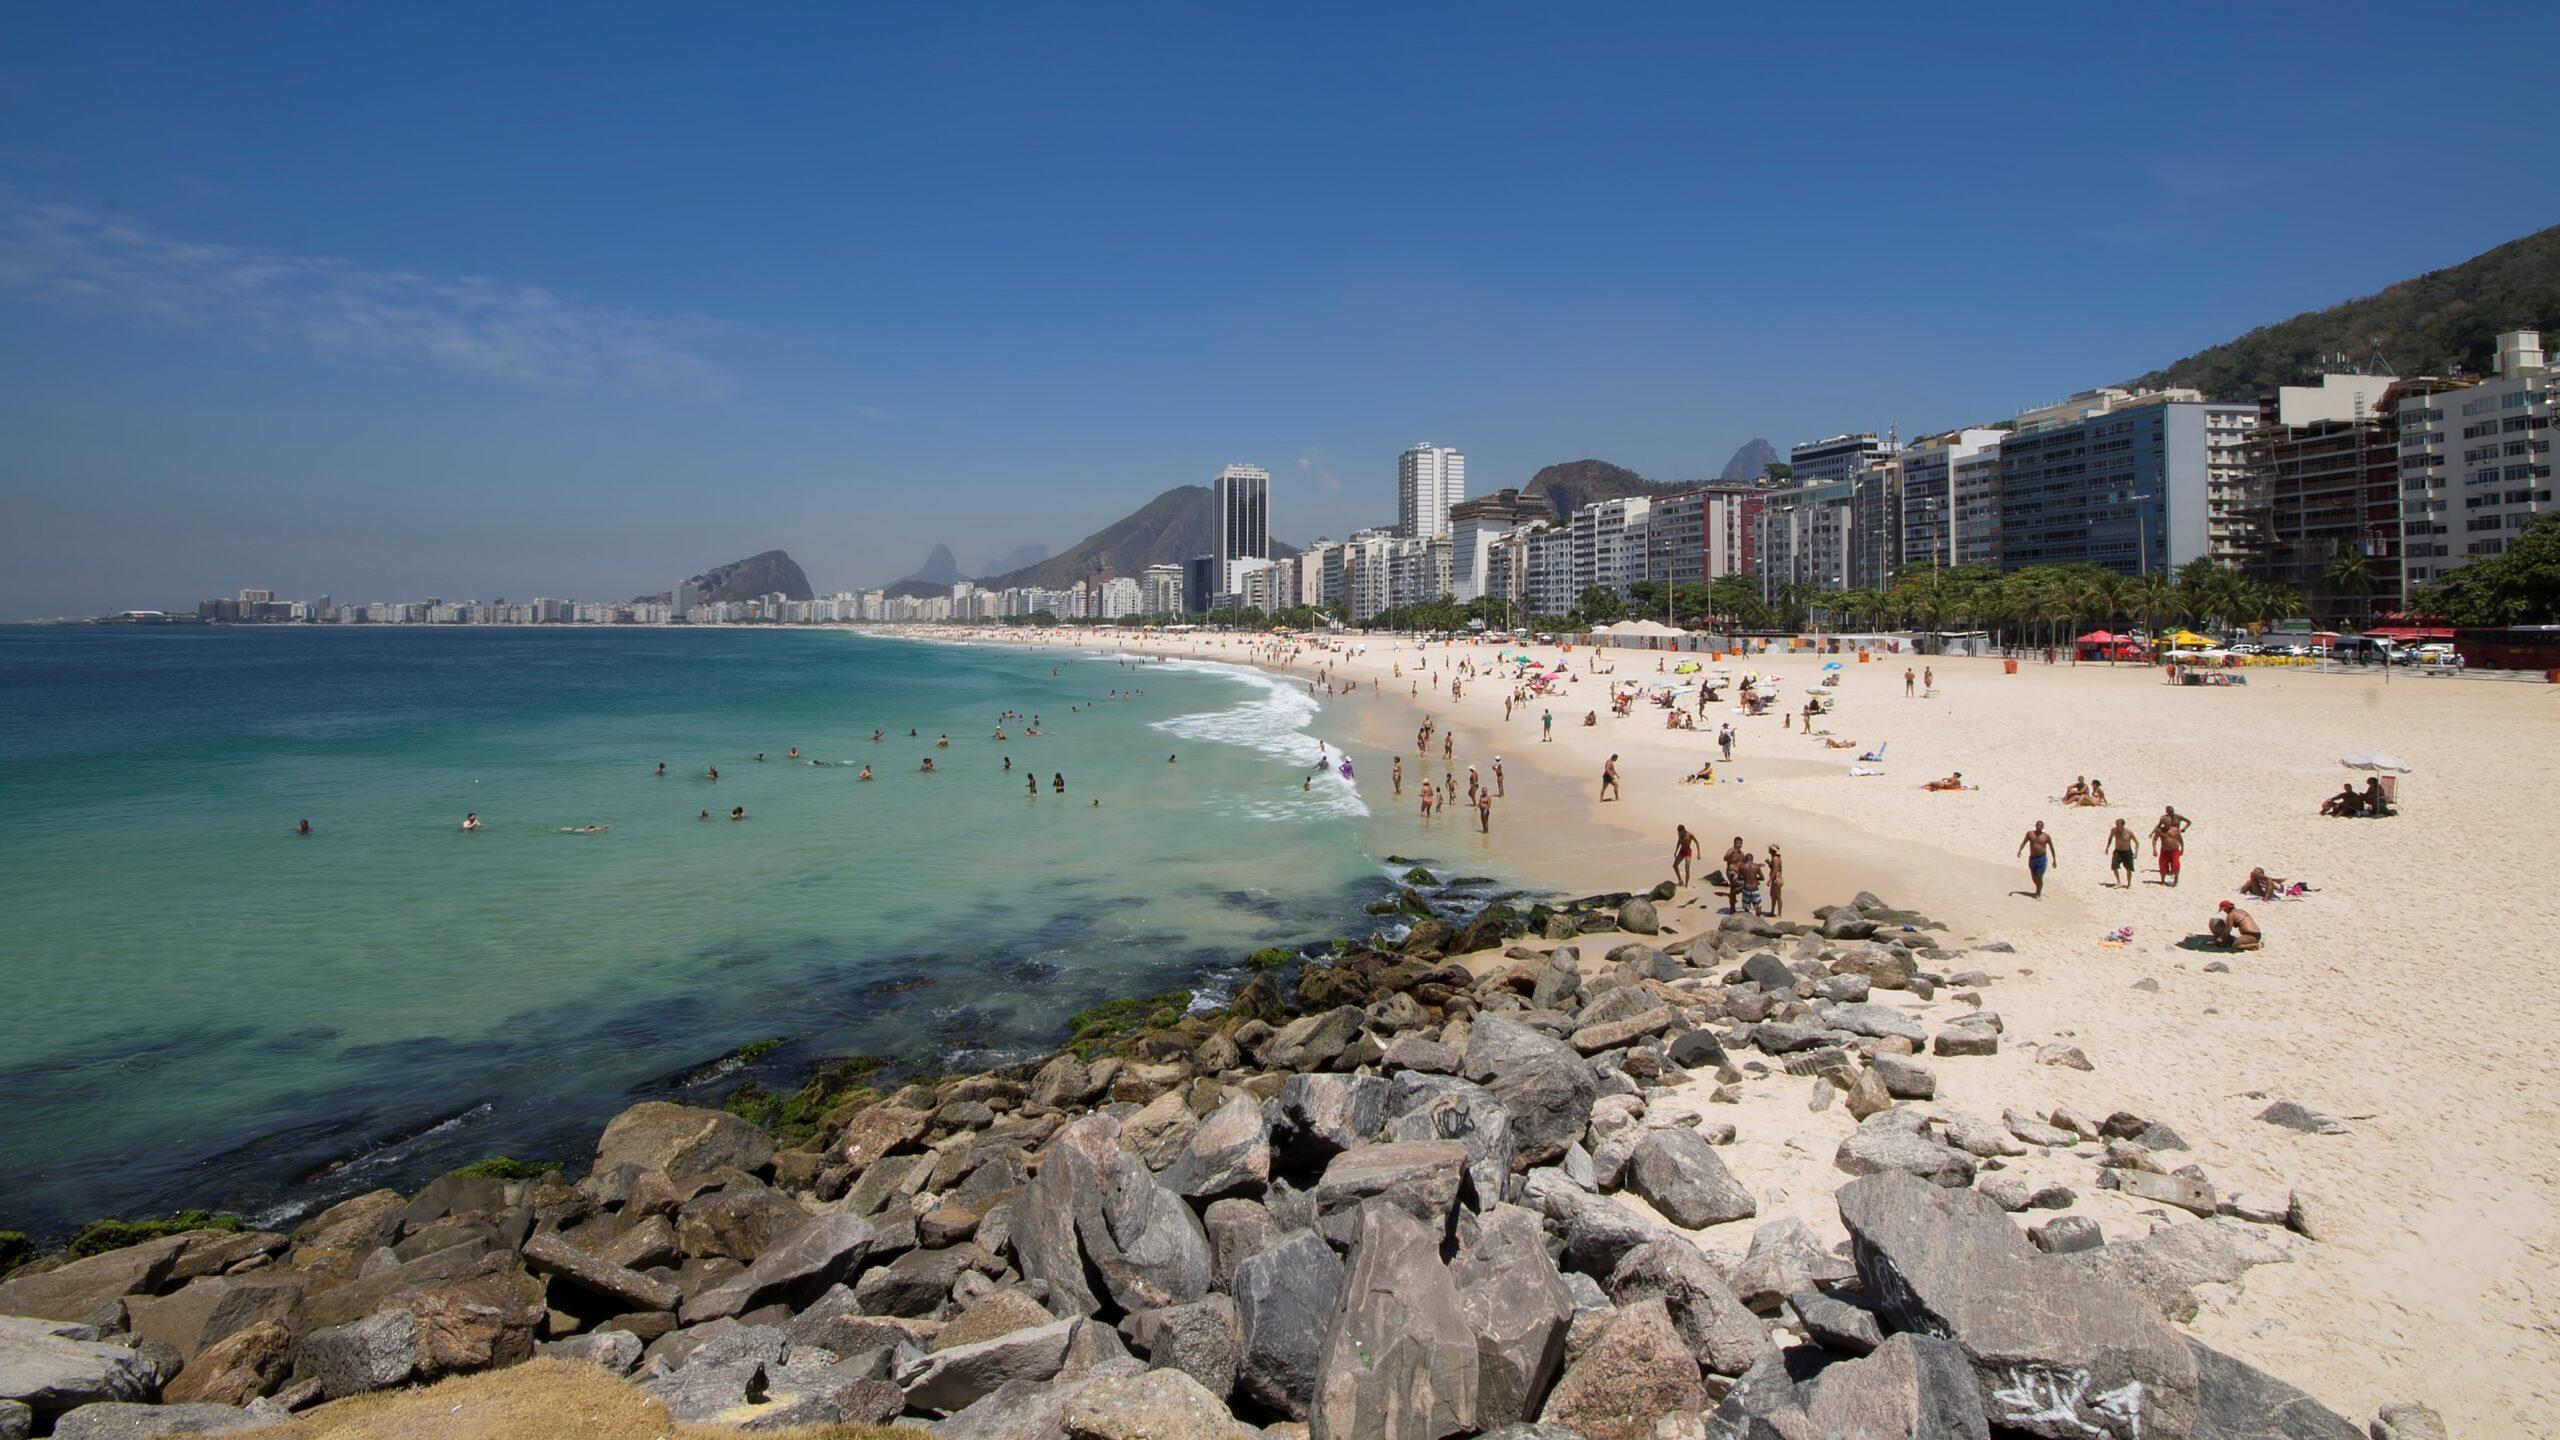 Rio de Janeiro - Spiaggia di Copacabana